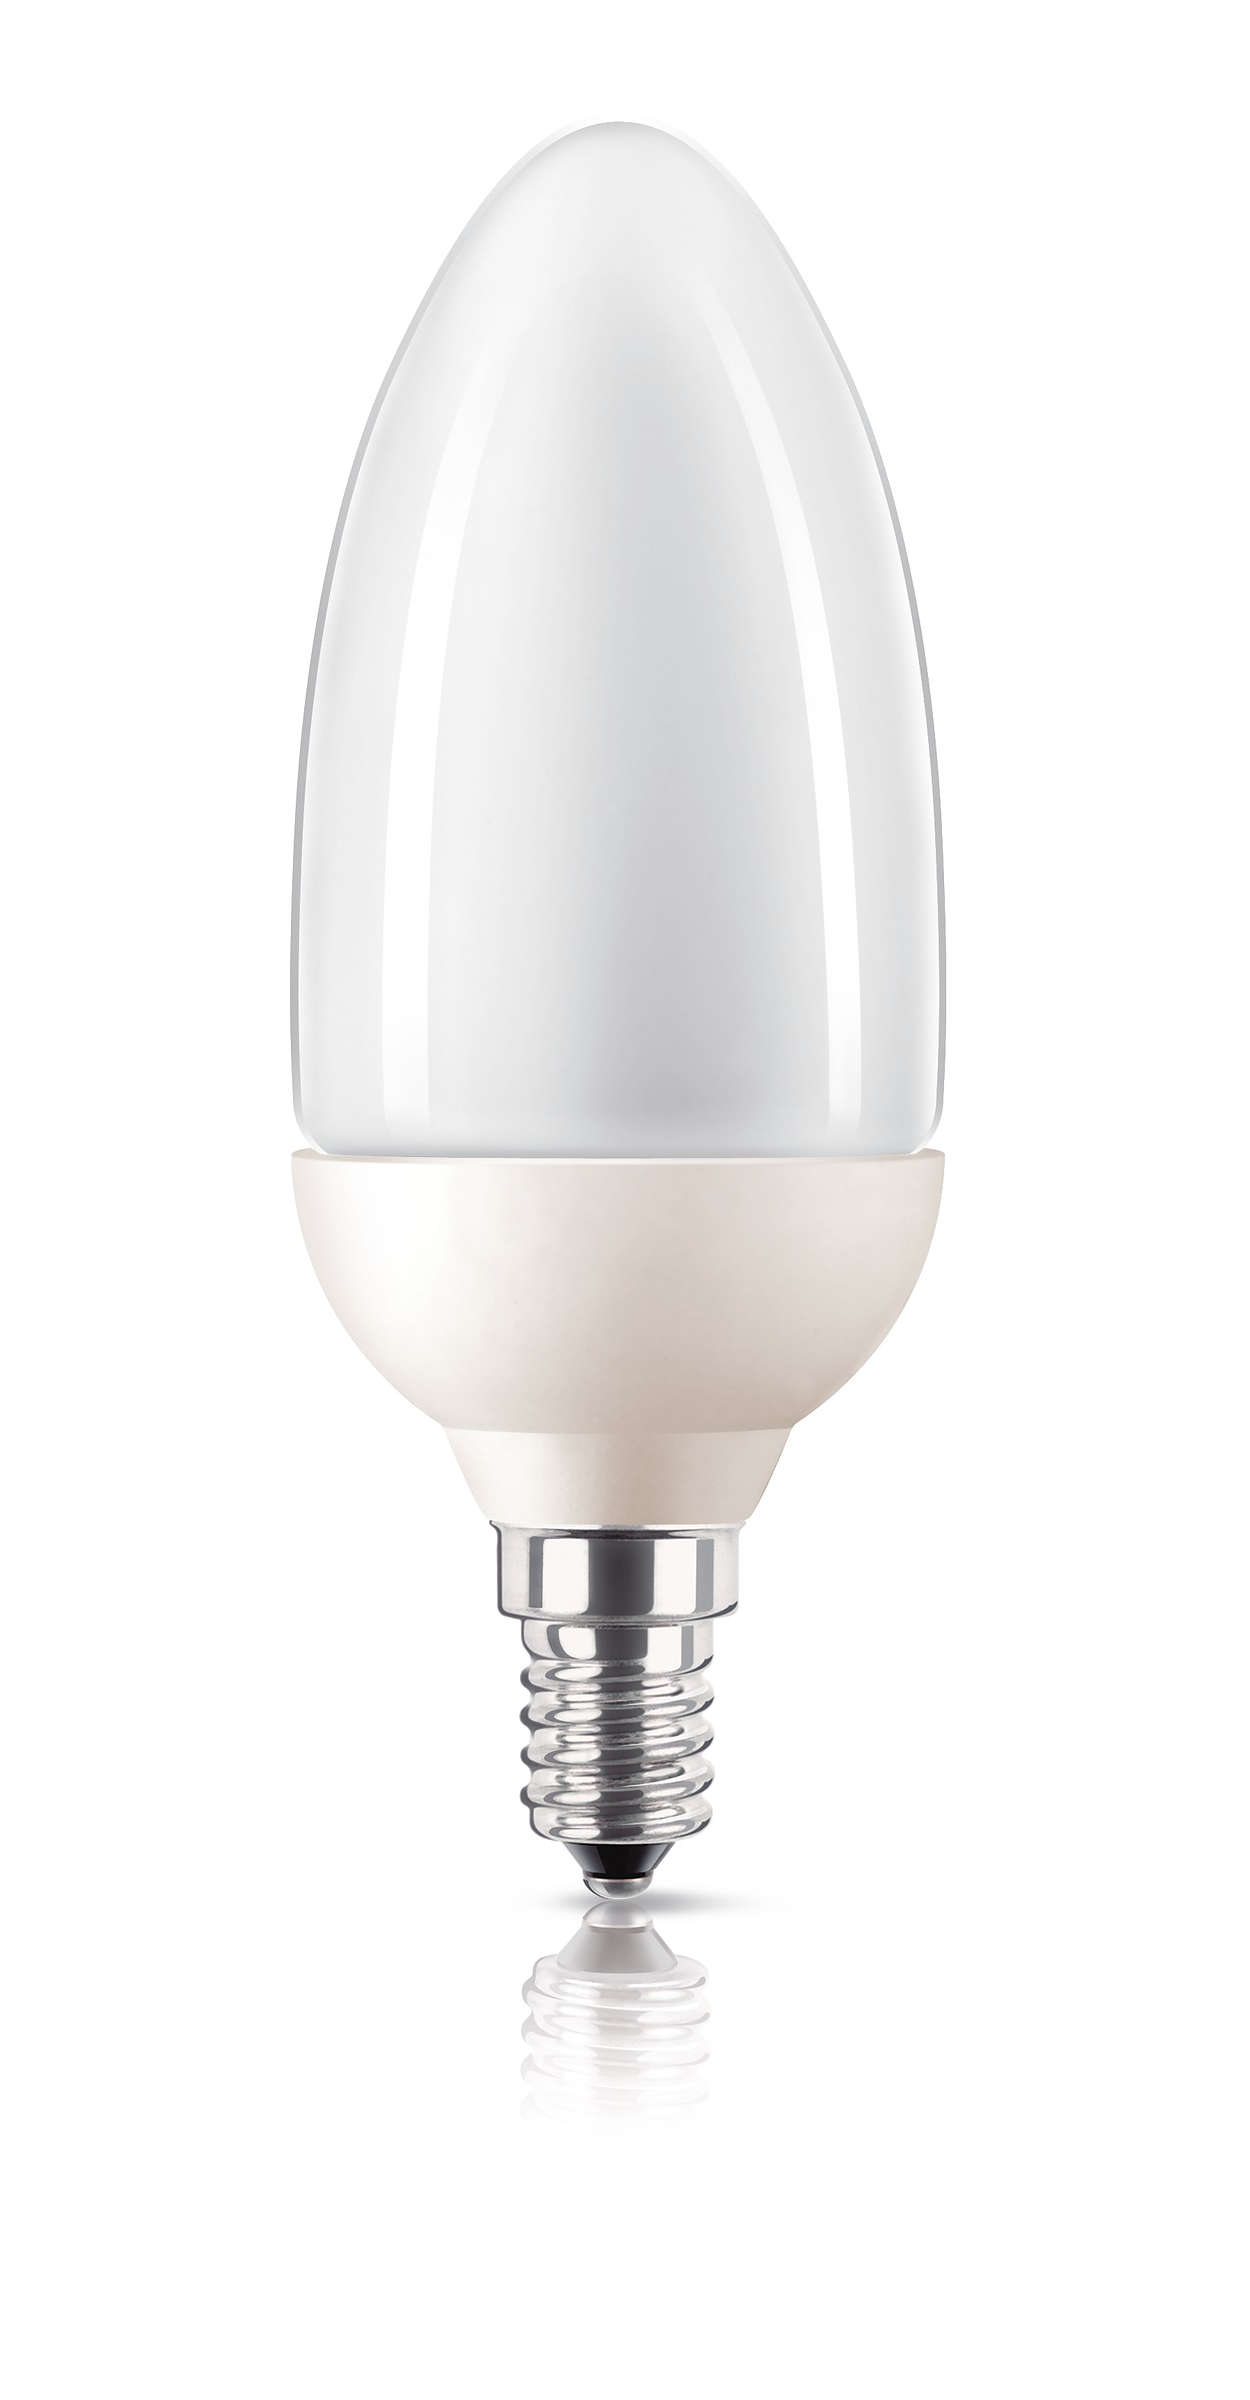 Soft and gentle energy saving light